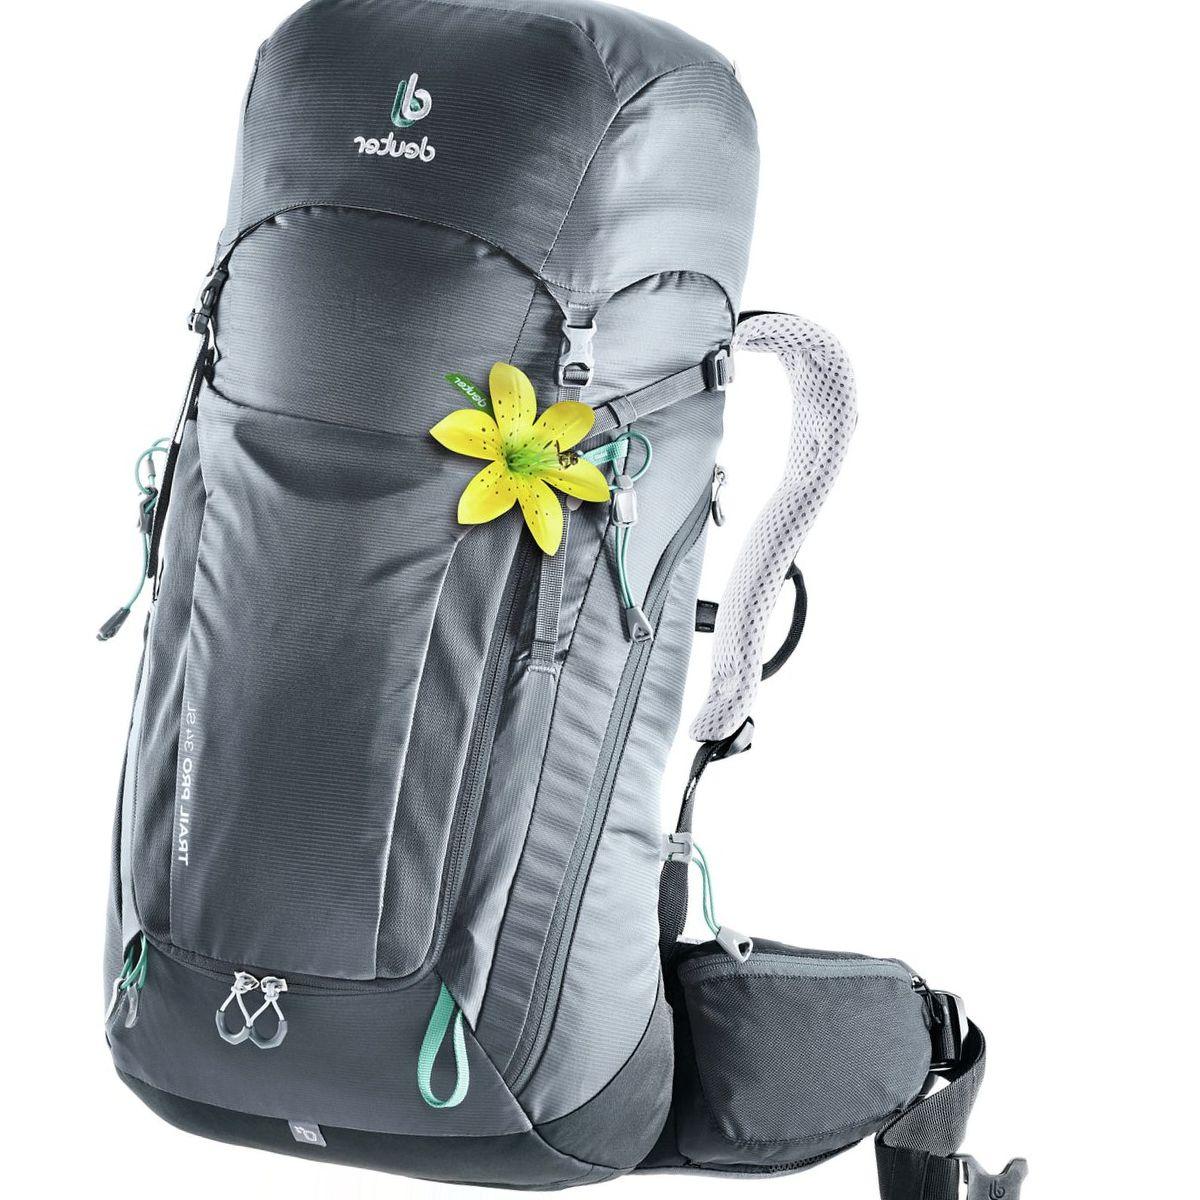 Deuter Trail Pro 34 SL Backpack - Women's